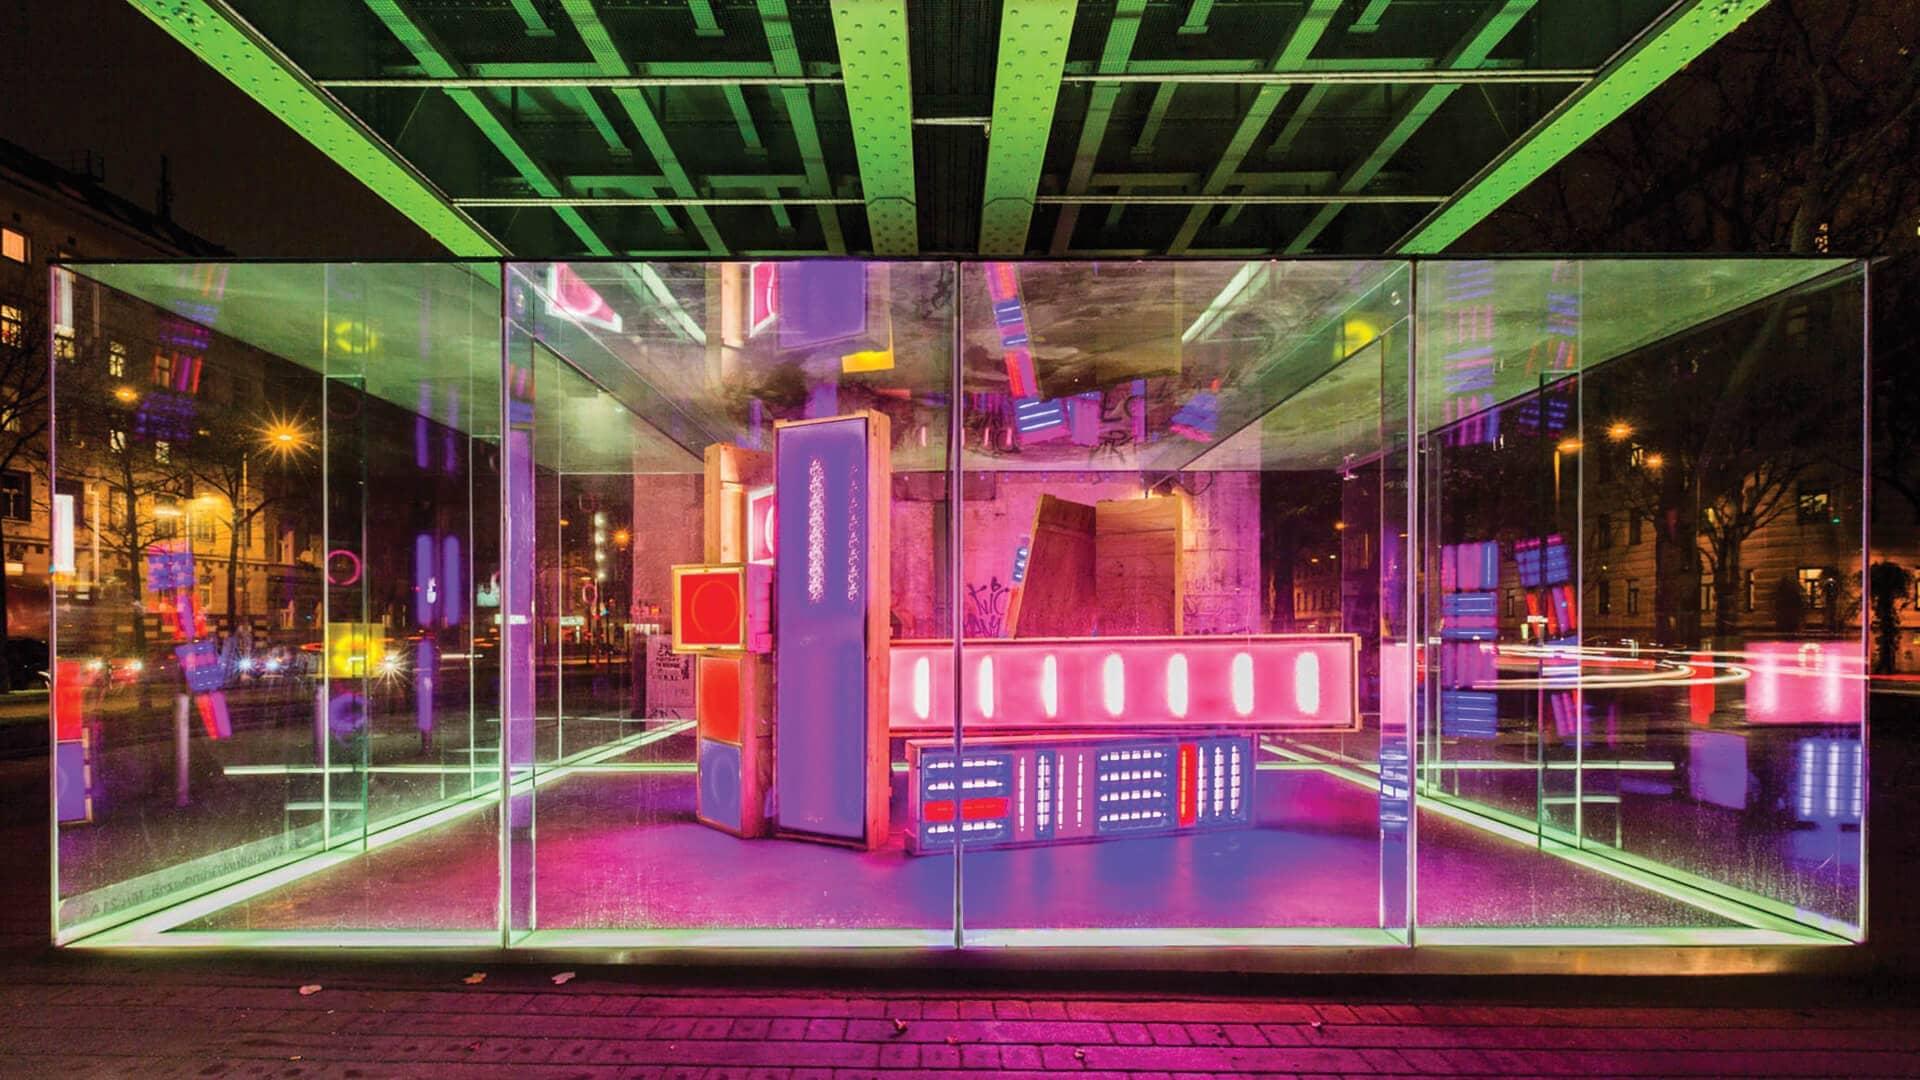 Hans Kotter's light sculptures unite design, photography and technology